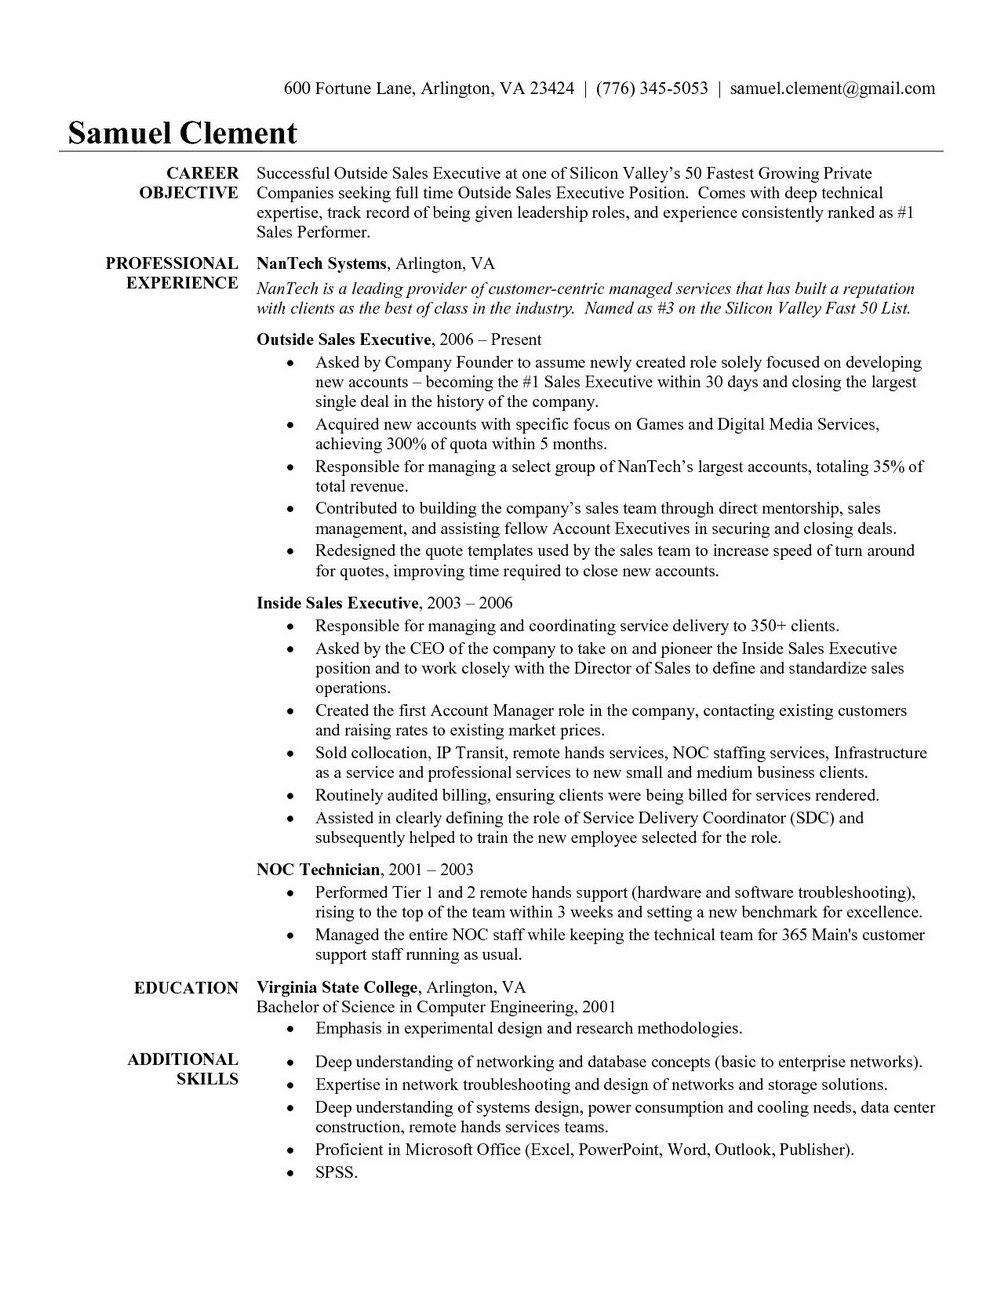 Best Executive Resume Samples